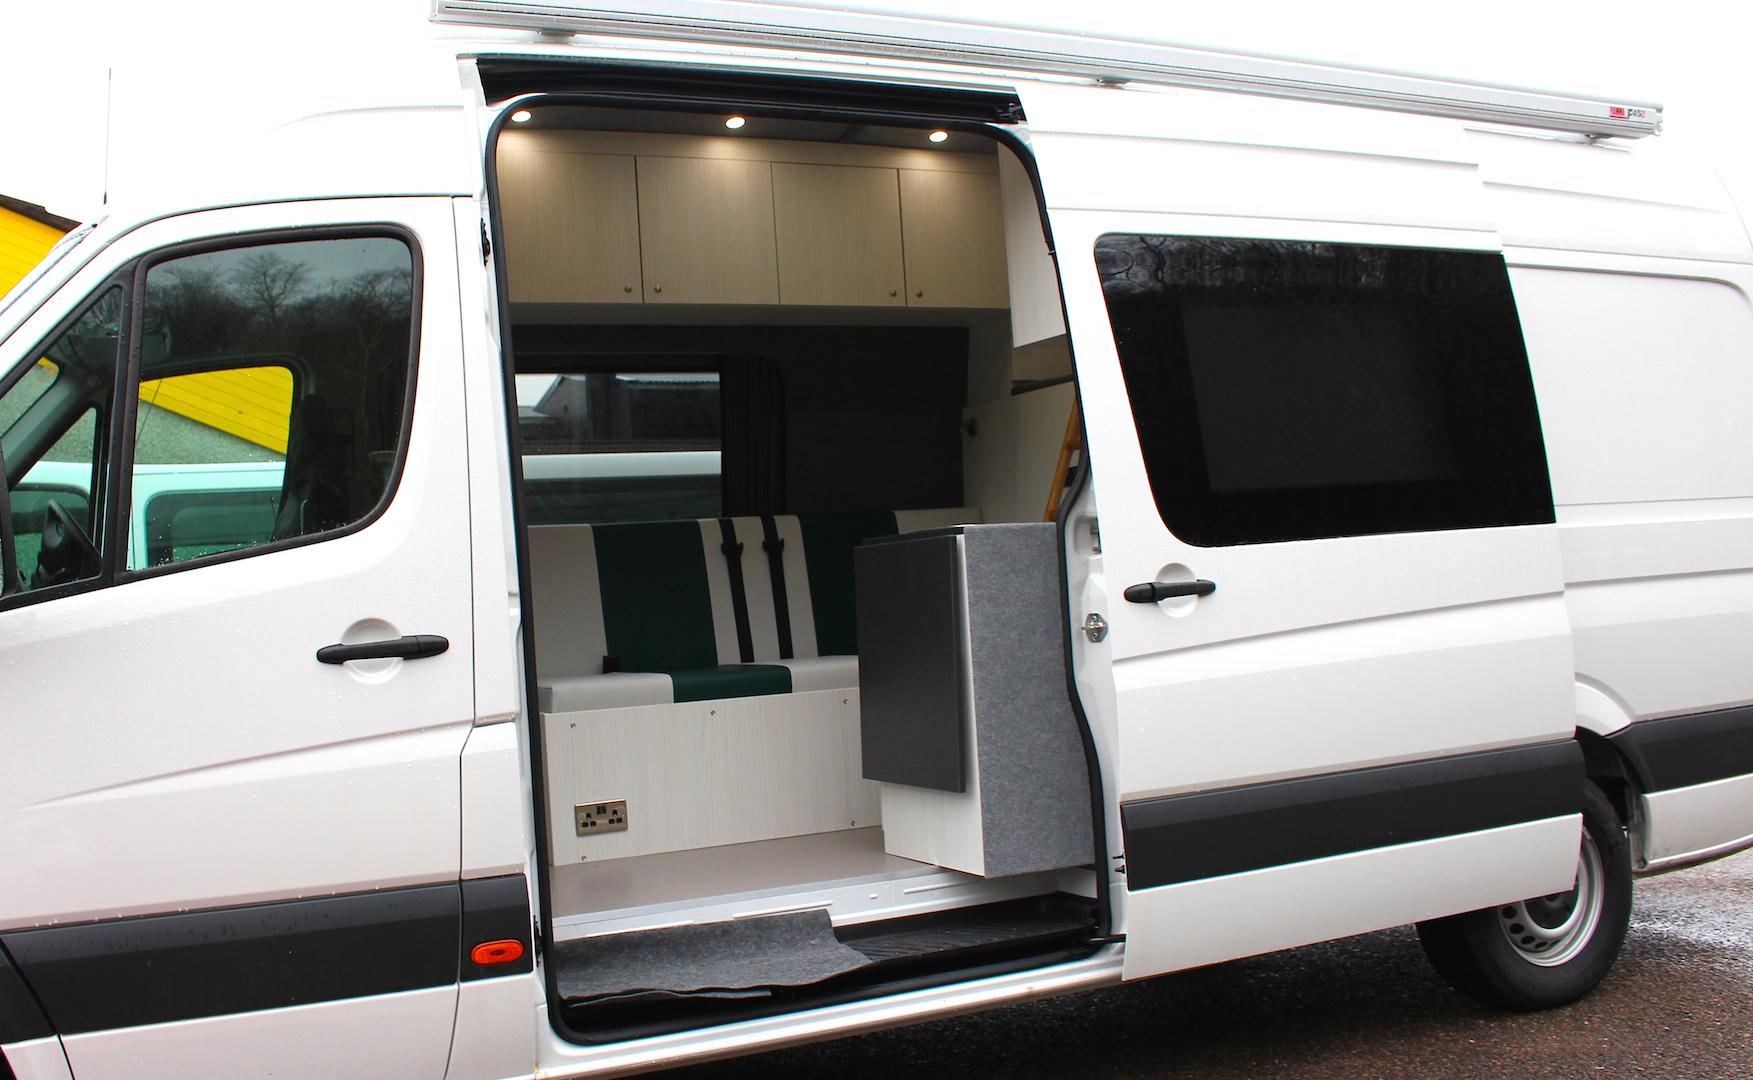 Volk Wagon Volkswagen Crafter Campervan